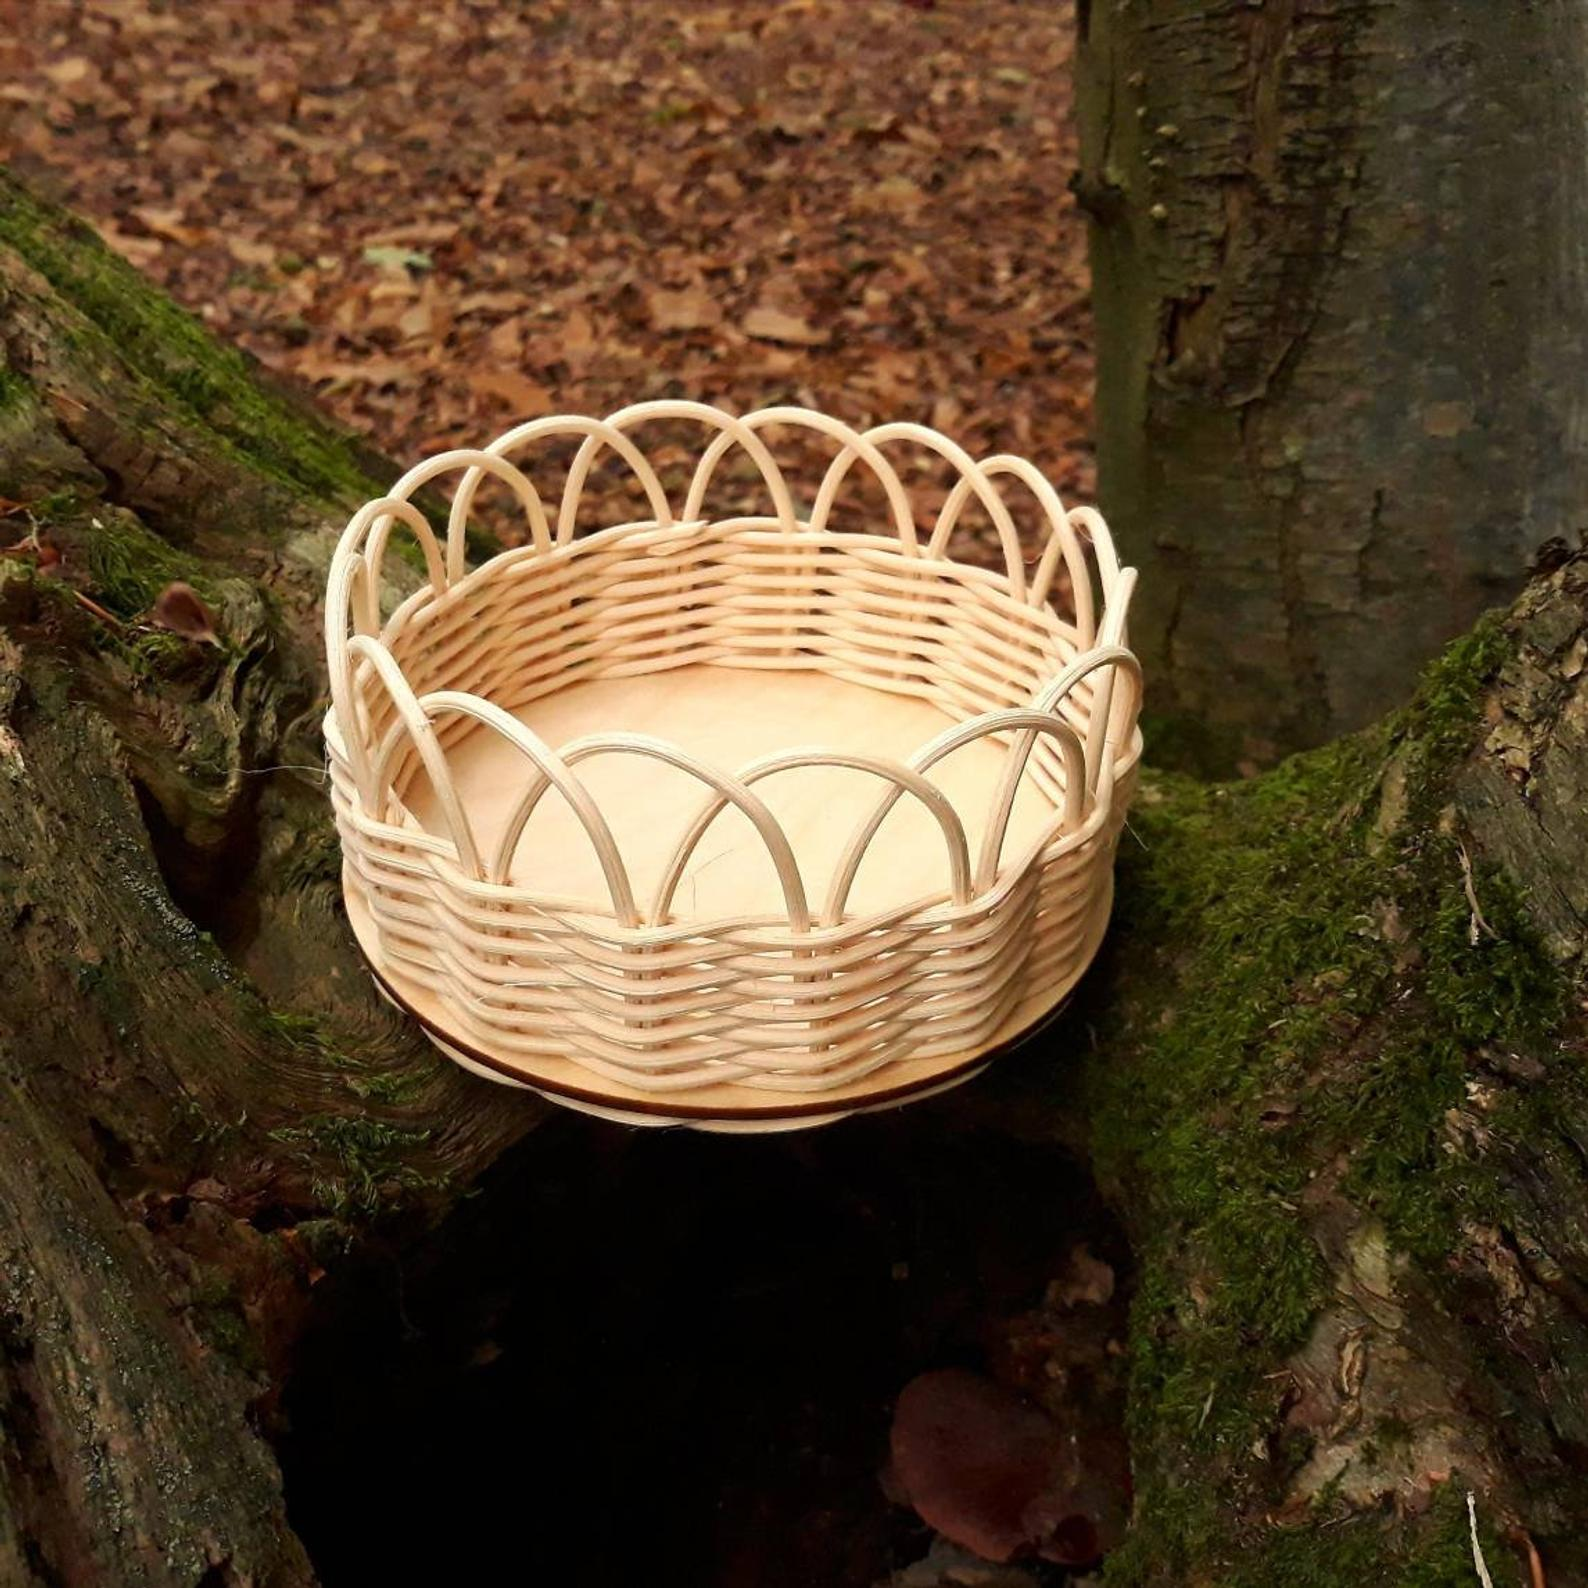 diy basket weaving kit for beginners